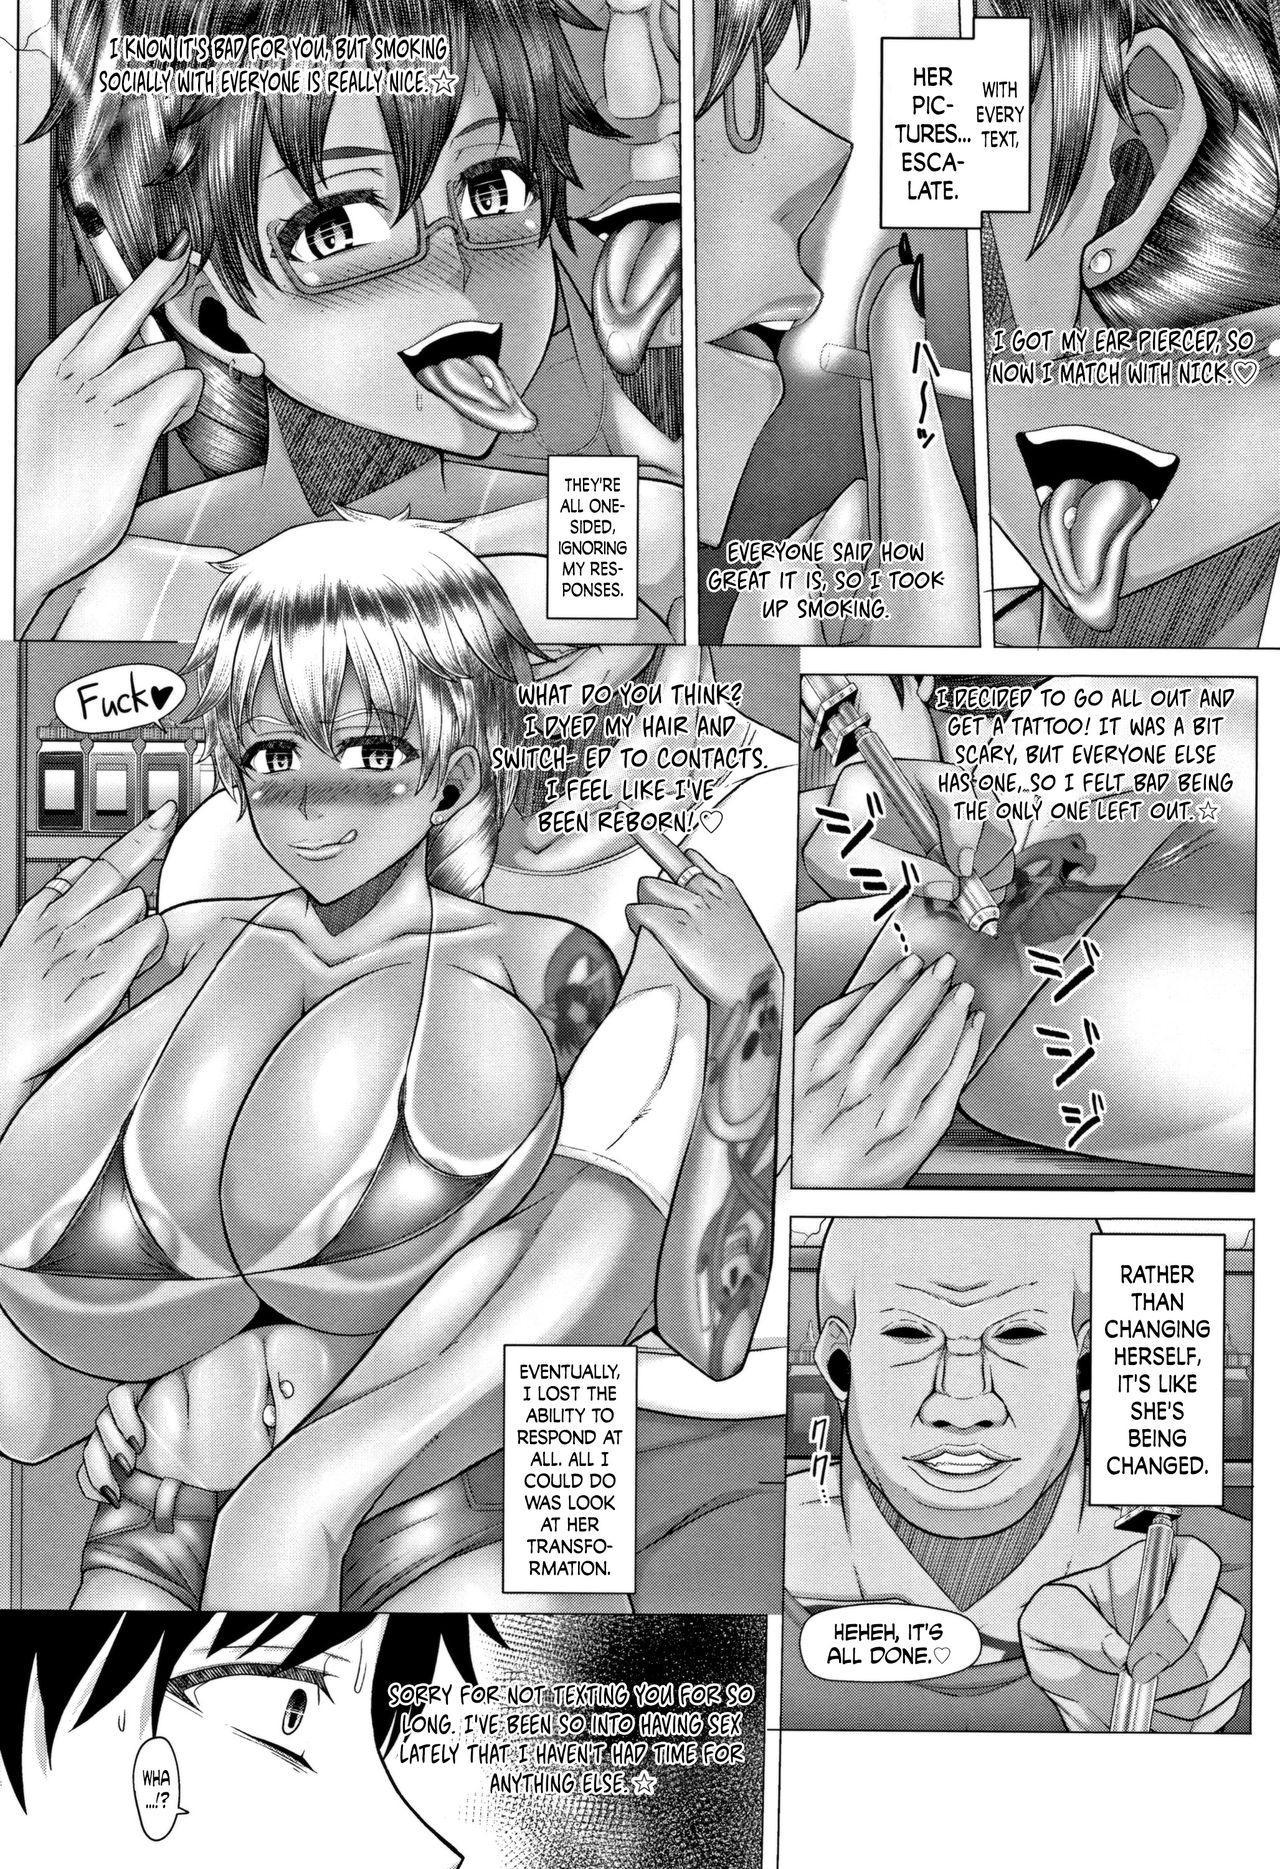 [Inoue Nanaki] Joushiki Daha! Kuro Gal Bitch-ka Seikatsu Ch. 1-3, 5-8 [English] [Dark Mac + N04h] 91